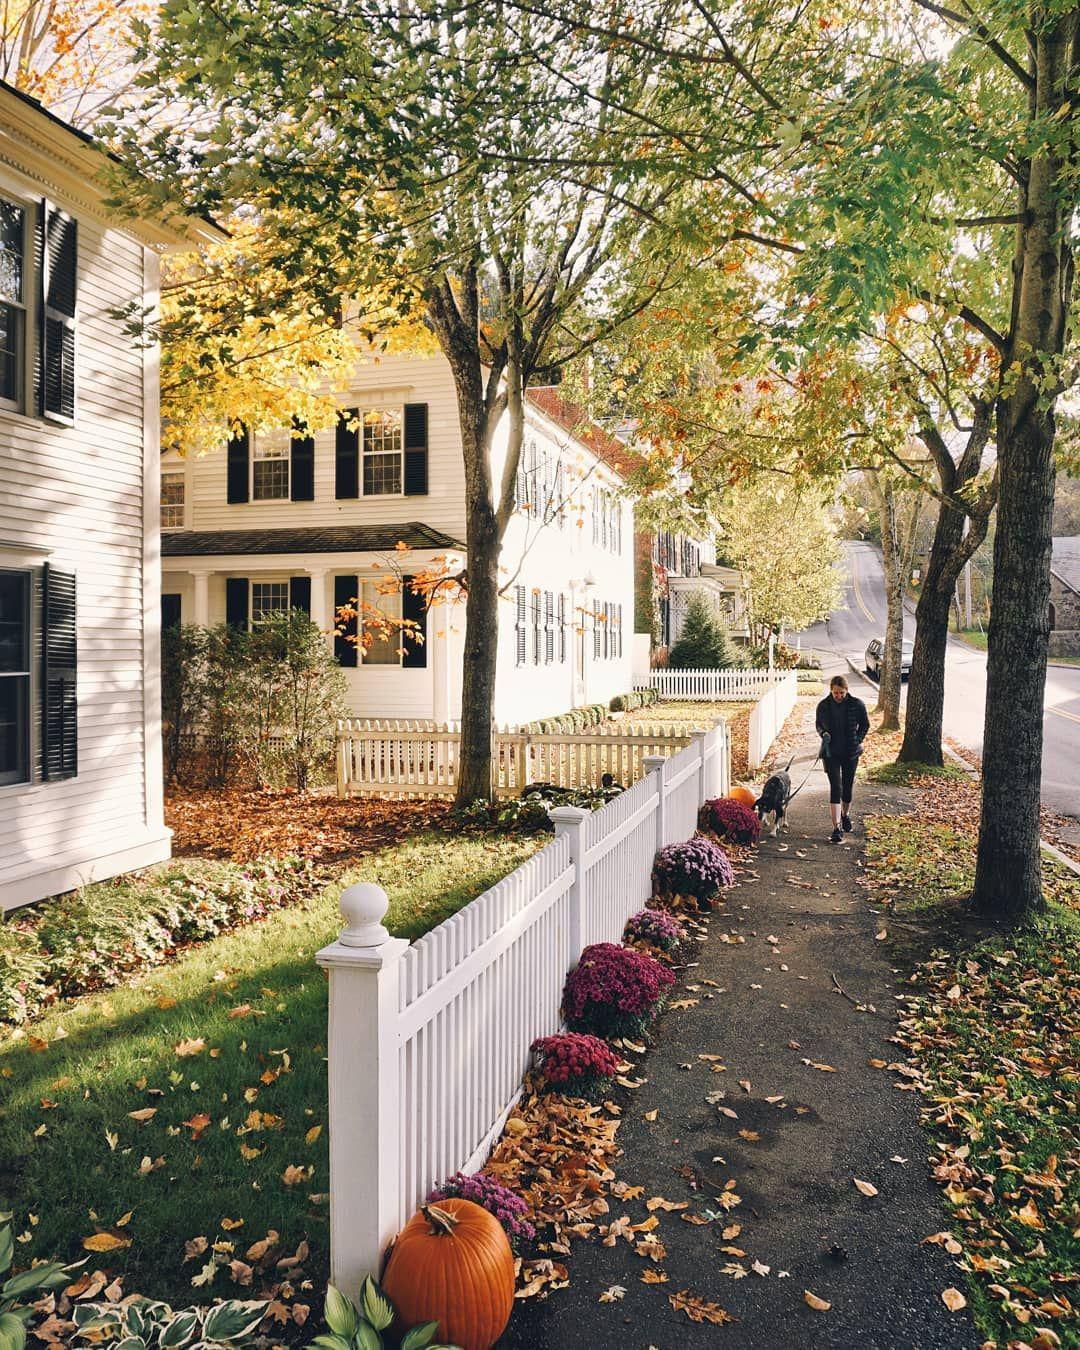 fran acciardo fall october autumnnal neighborhood this week's top 10 friday links blog post